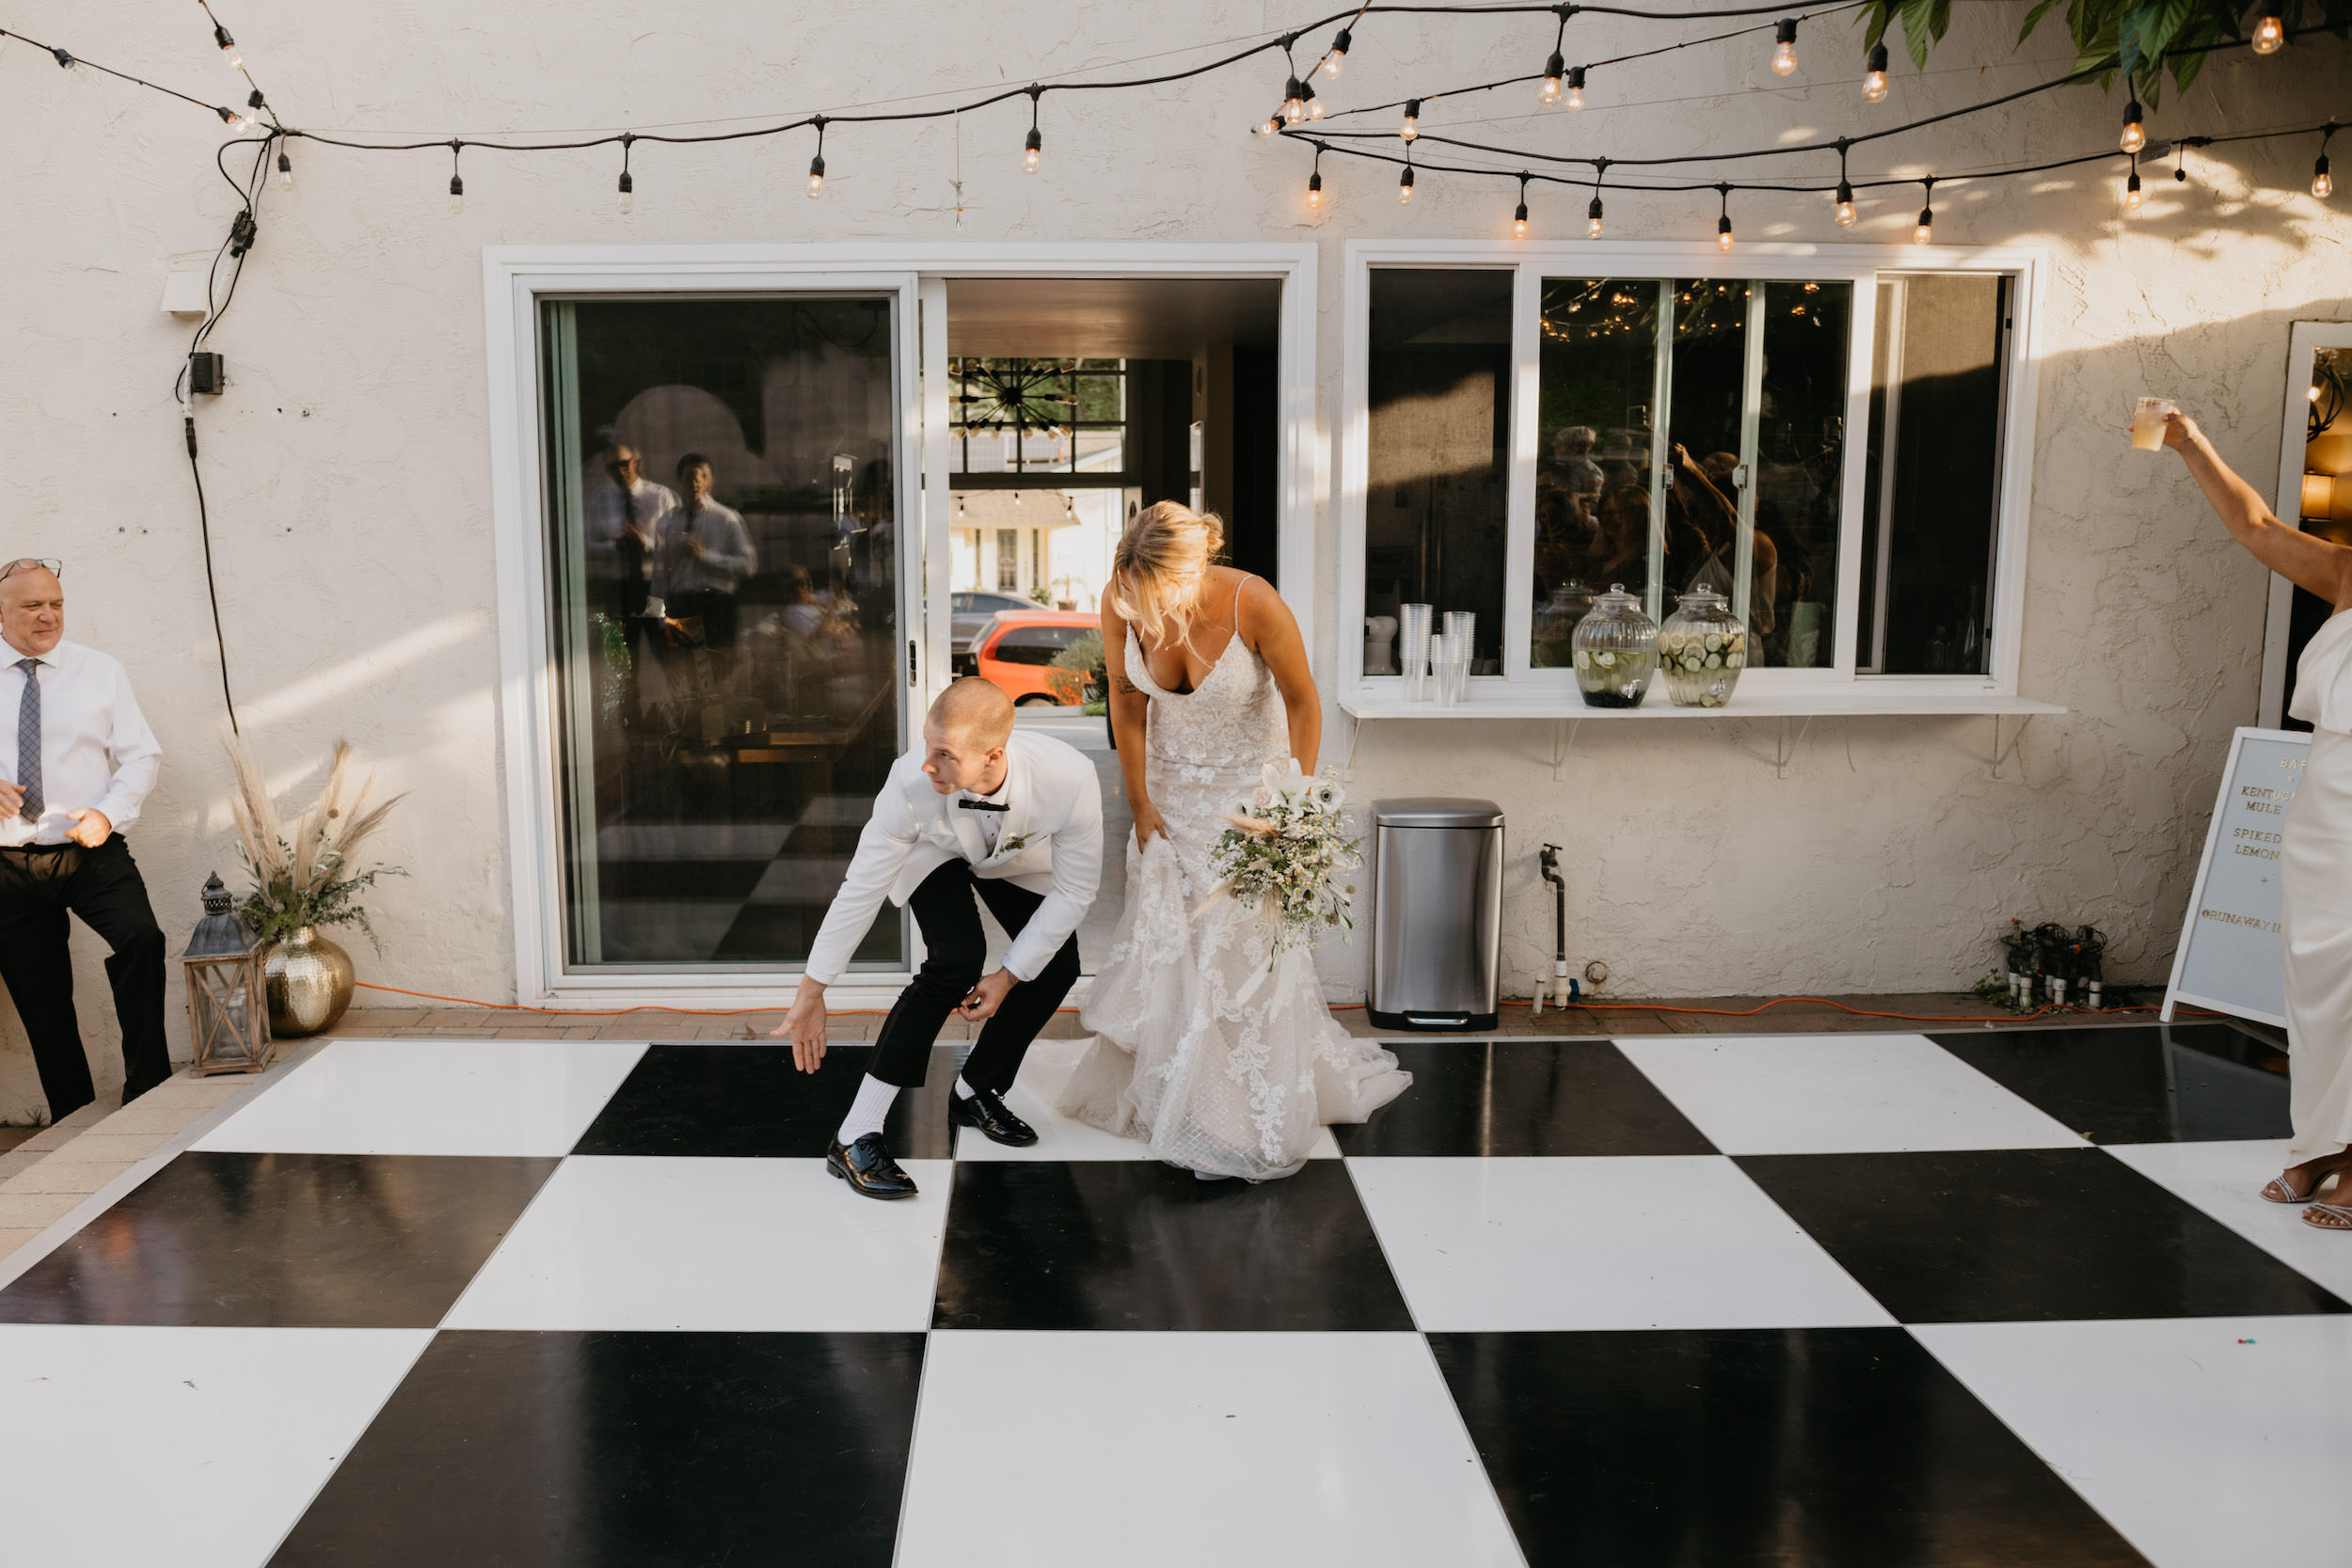 Bride and Groom grand entrance in Laguna Beach Backyard Wedding, image by Fatima Elreda Photo